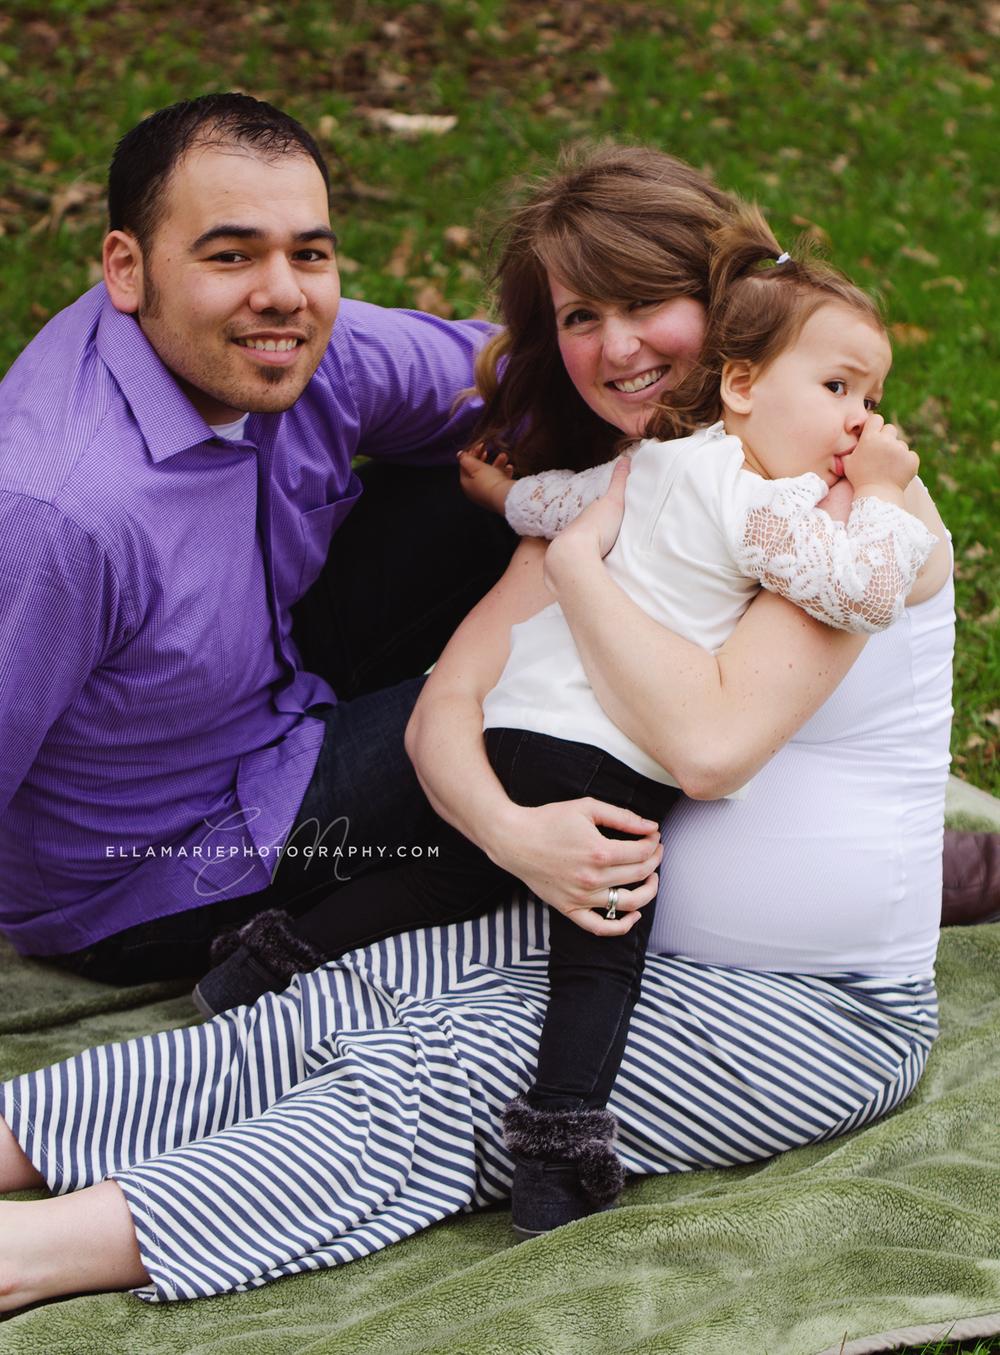 EllaMariePhotography_maternity_baby_infant_Baden_ON_New_Hamburg_Stratford_Waterloo_Kitchener_Guelph_Cambridge_Listowel_photographer_photography_12.jpg